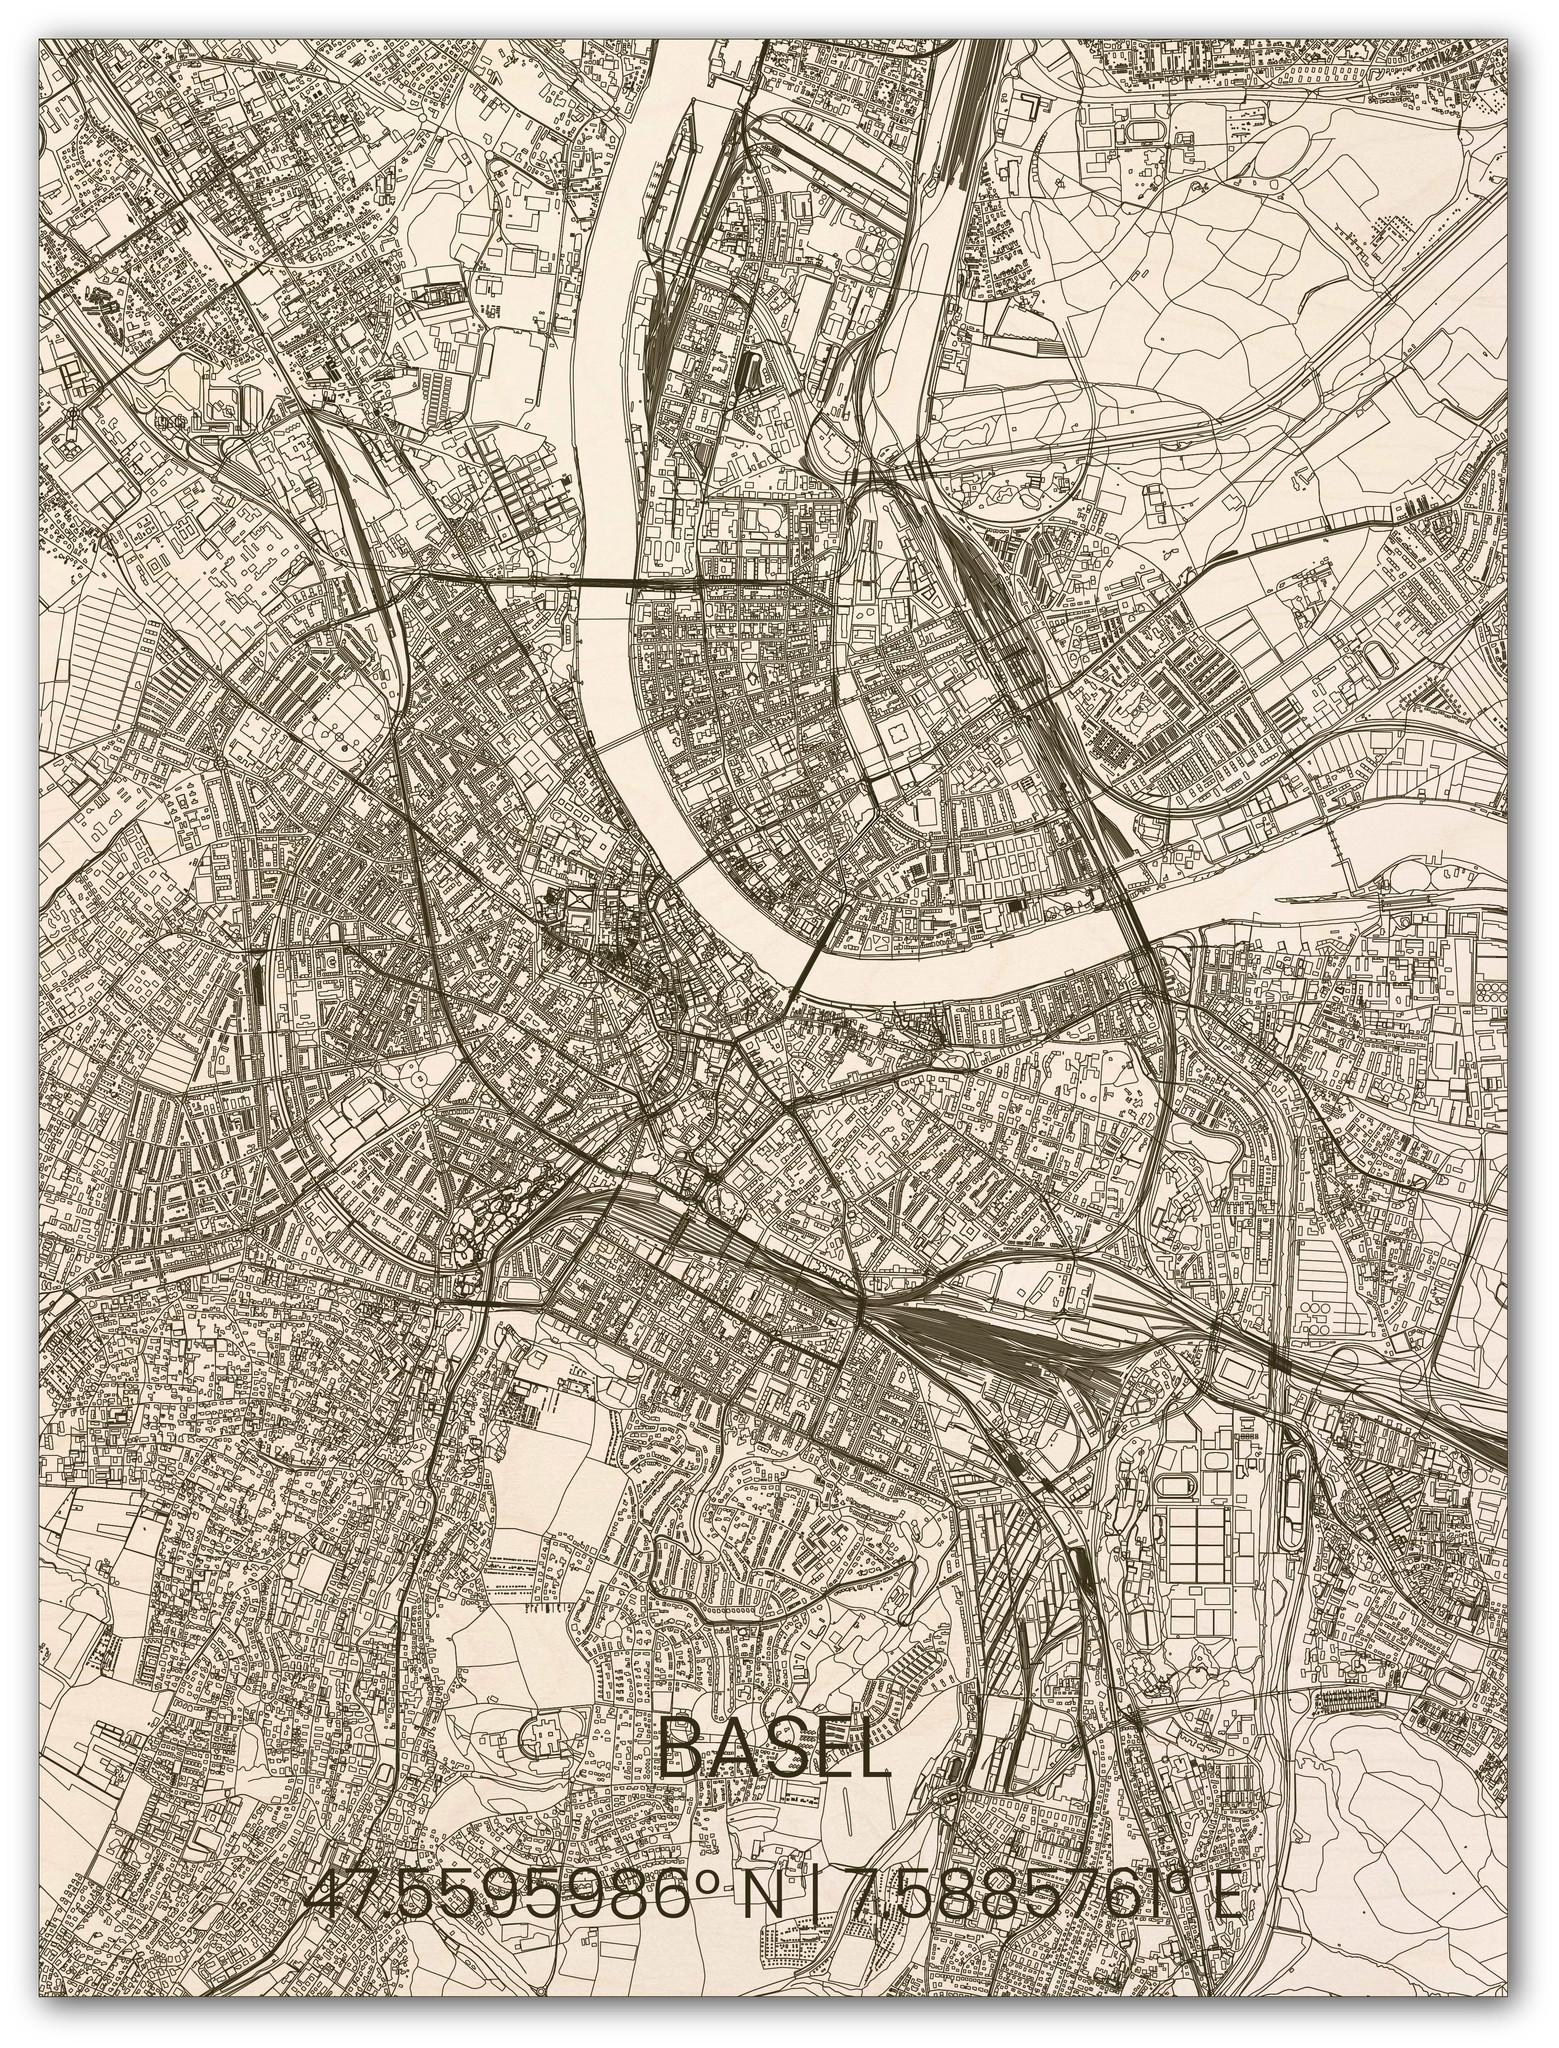 Houten stadsplattegrond Basel-1